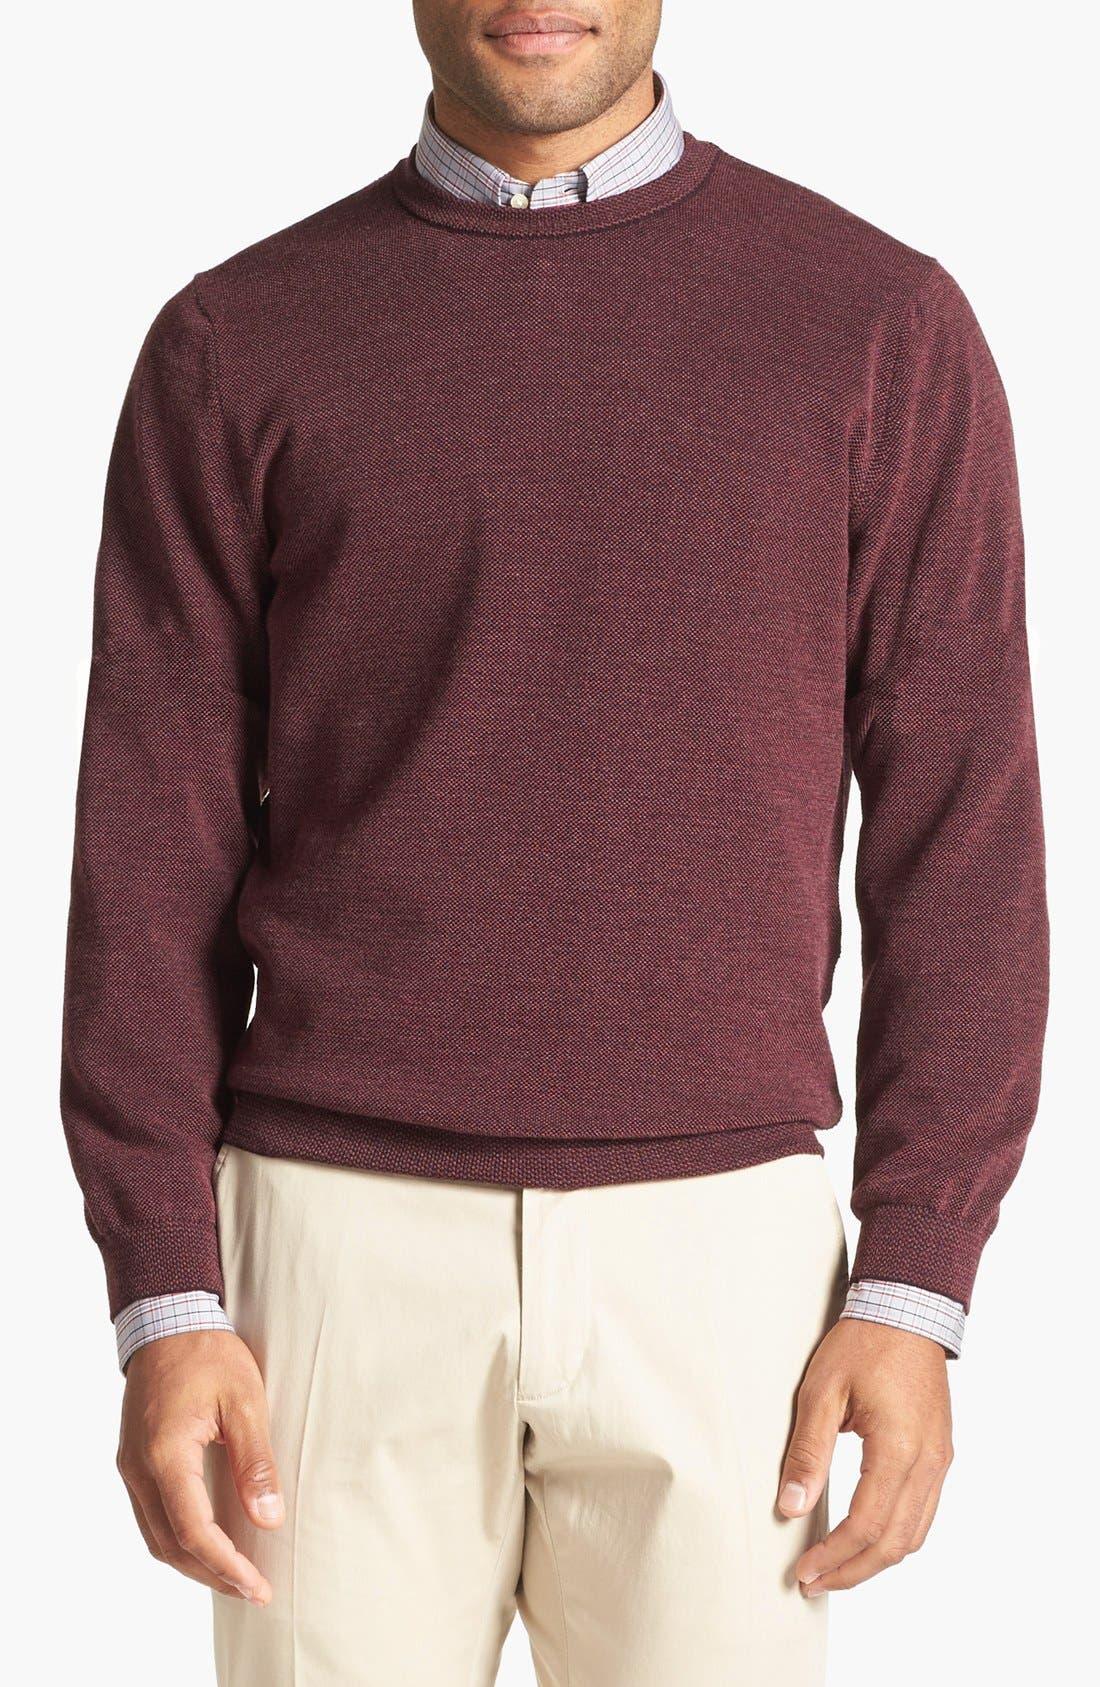 Alternate Image 1 Selected - John W. Nordstrom® Merino Wool Crewneck Sweater